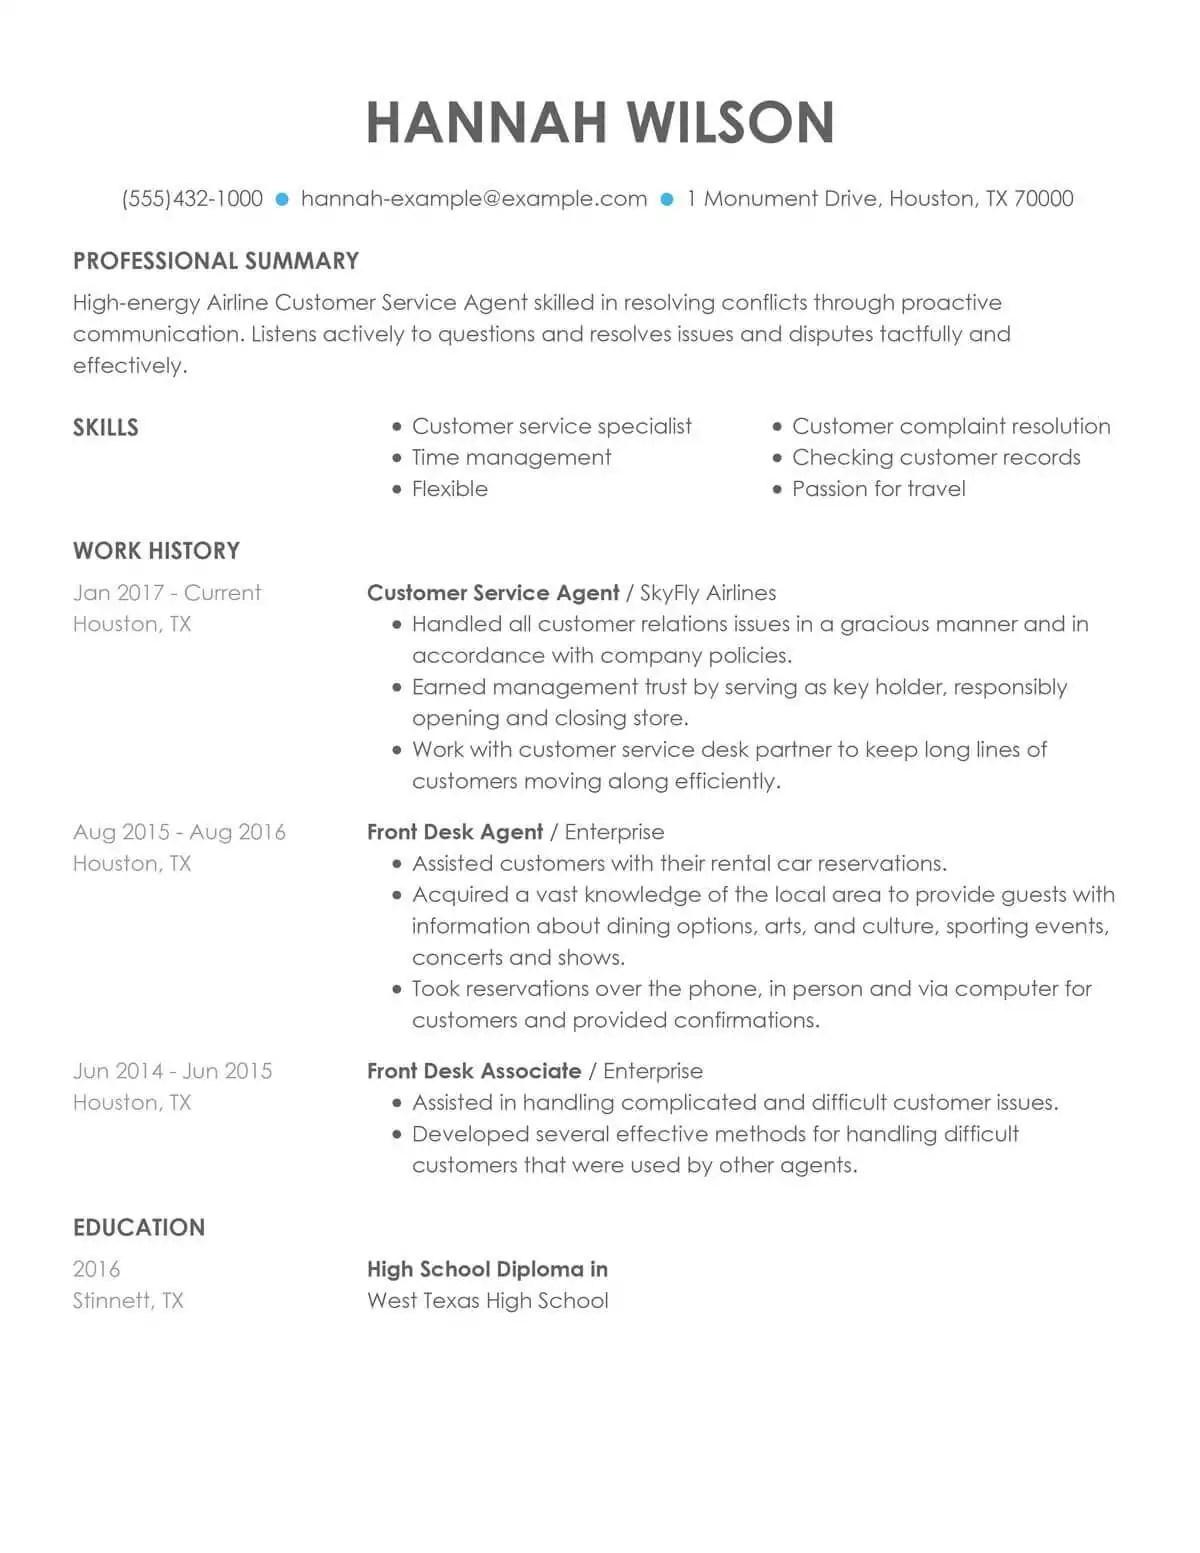 Customer Service Representative Resume Examples  Free to Try Today  MyPerfectResume